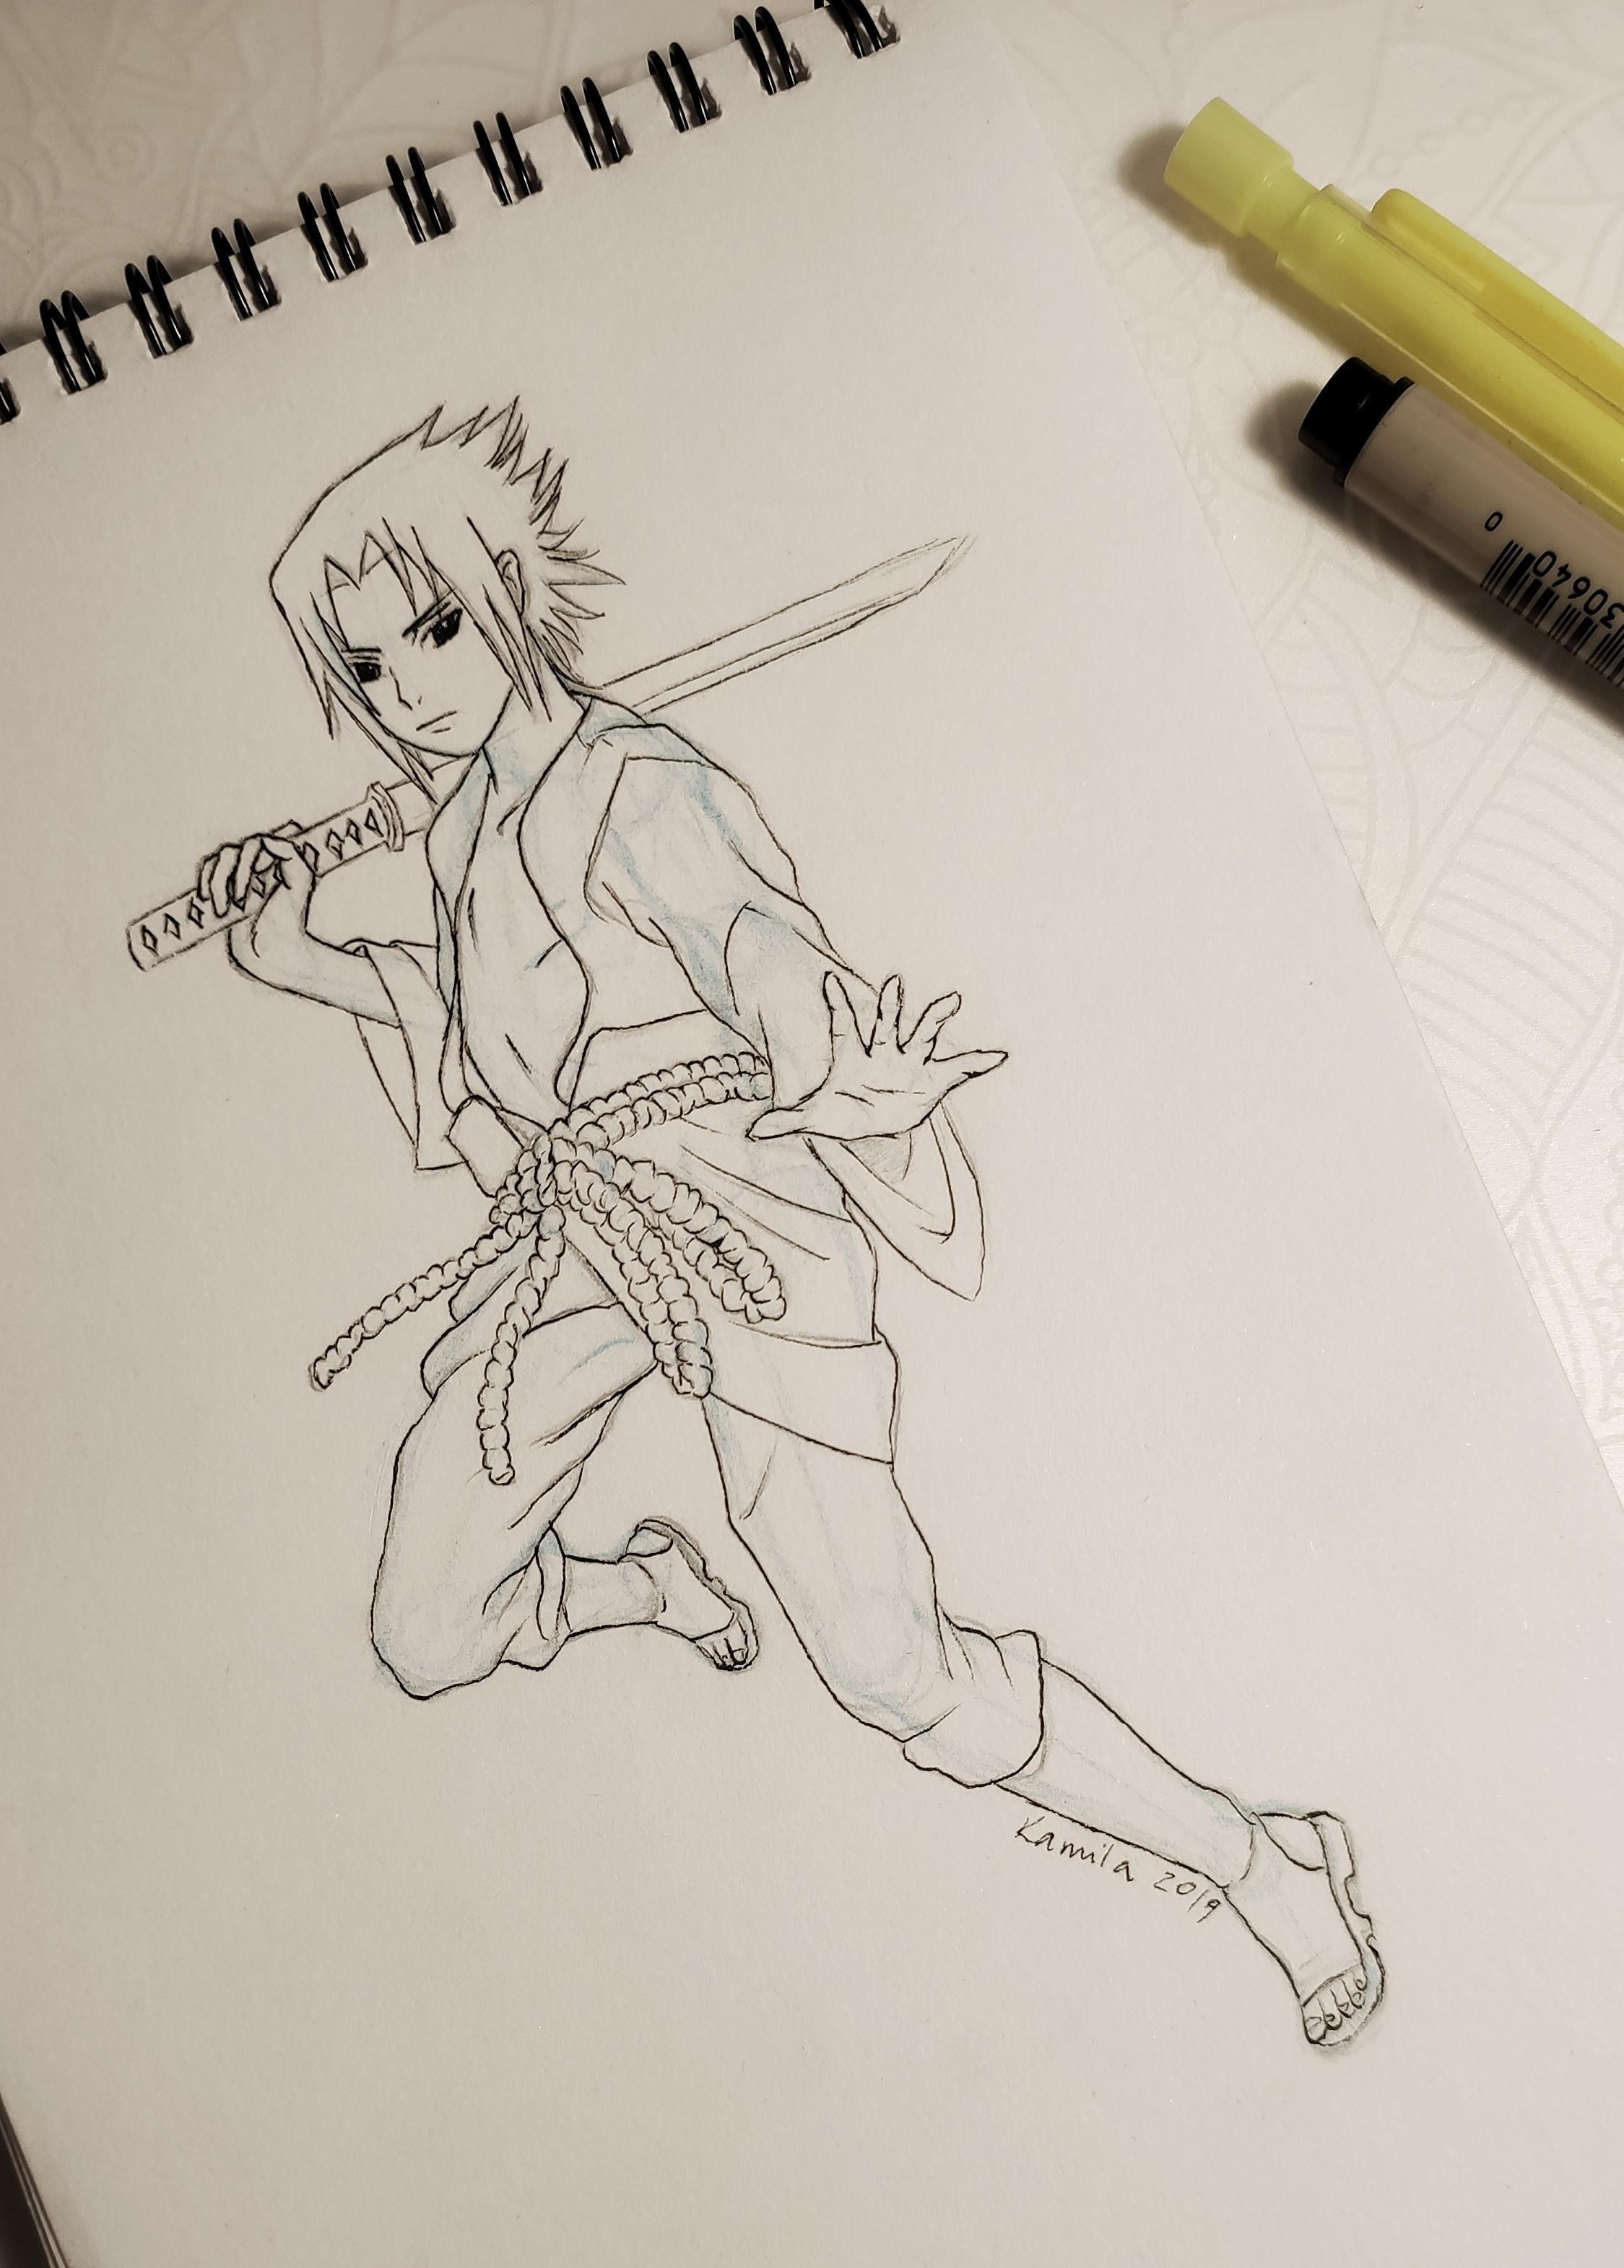 Full Body Sasuke Drawing : sasuke, drawing, Boyfriend, Asked, Sasuke, After, Really, Break, Drawing., Constructive, Criticism., Naruto